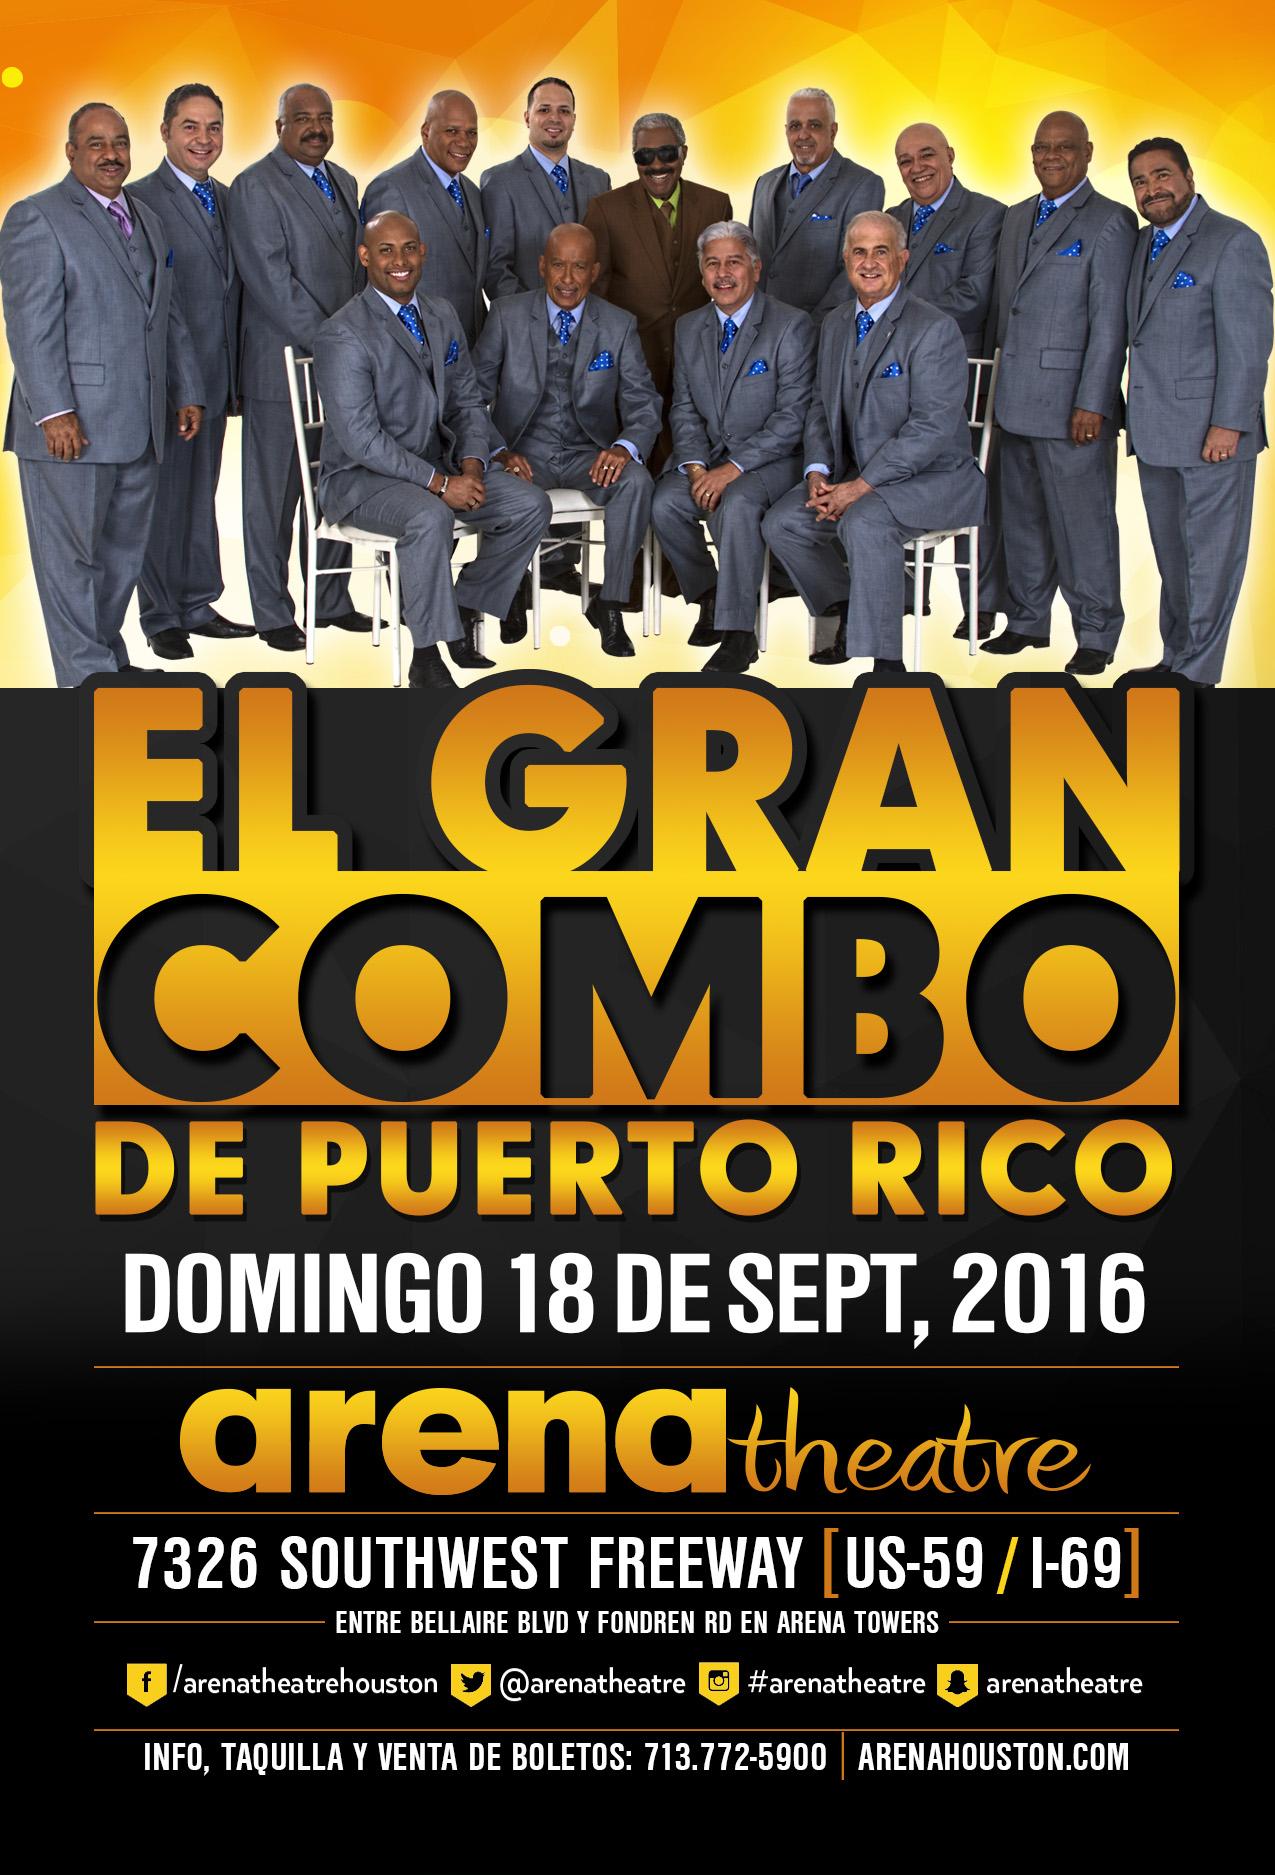 El Gran Combo de Puerto Rico on Sunday, September 18, 2016 (hispanichouston.com)